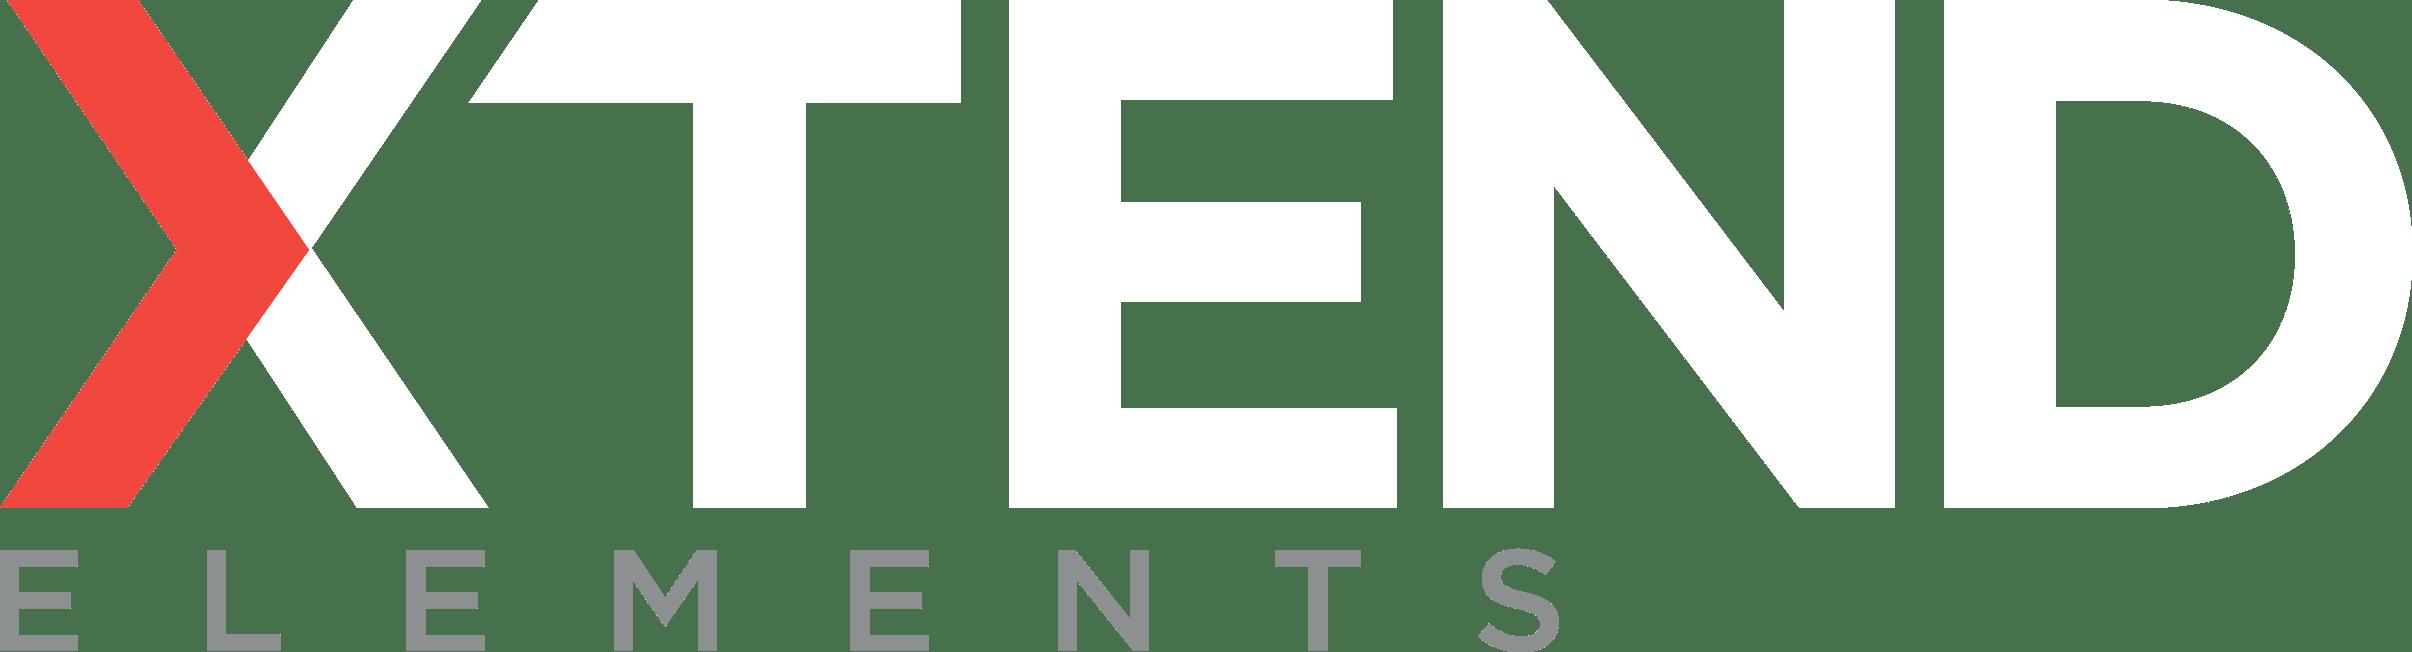 IMSA_Xtend_Logo-Whtie